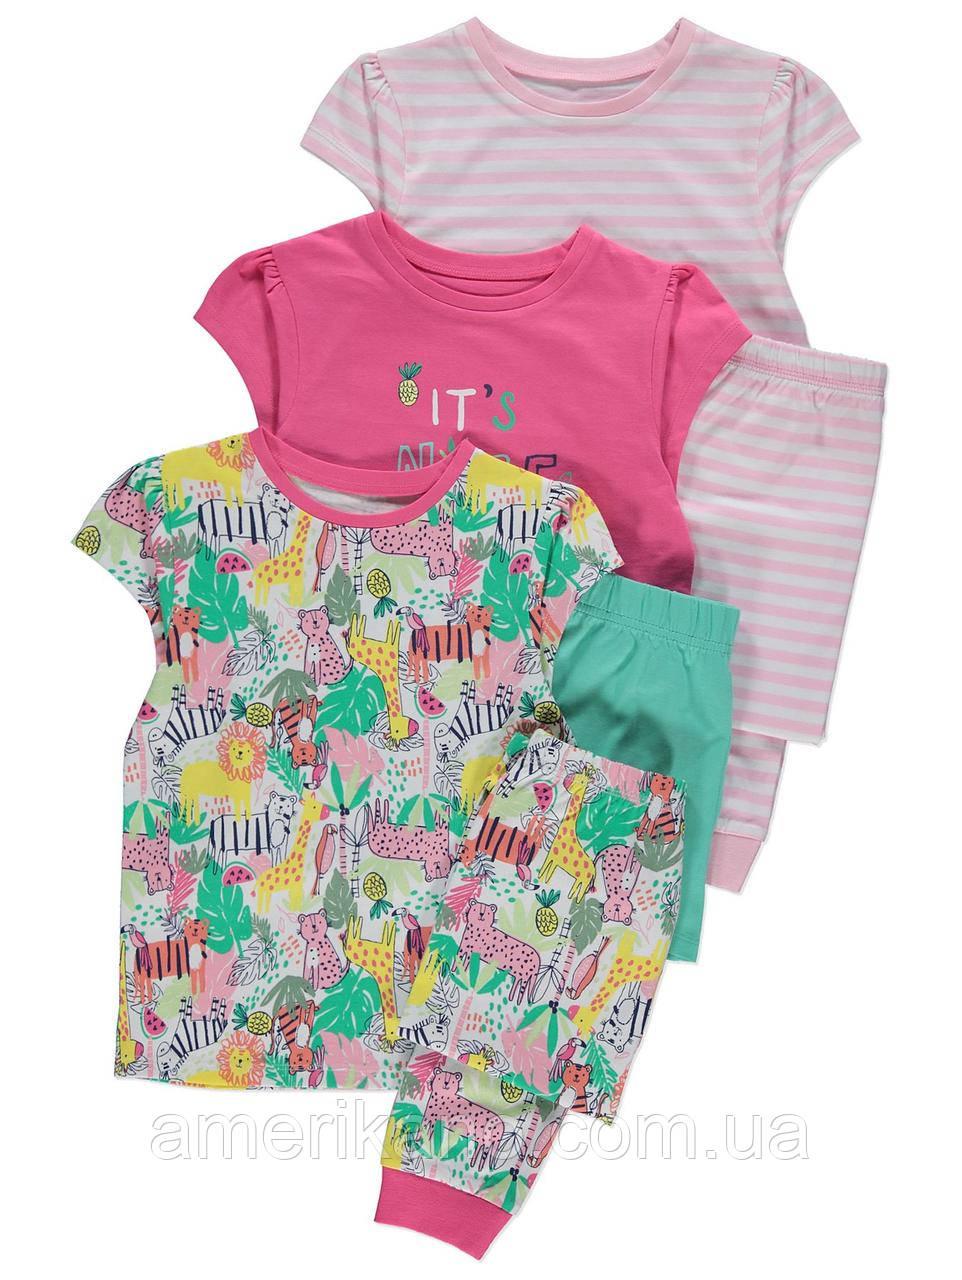 Хлопковая пижама для девочки от George (Джордж, Англия) 1,5-2 года на рост 86-92 см. Цена за штуку.